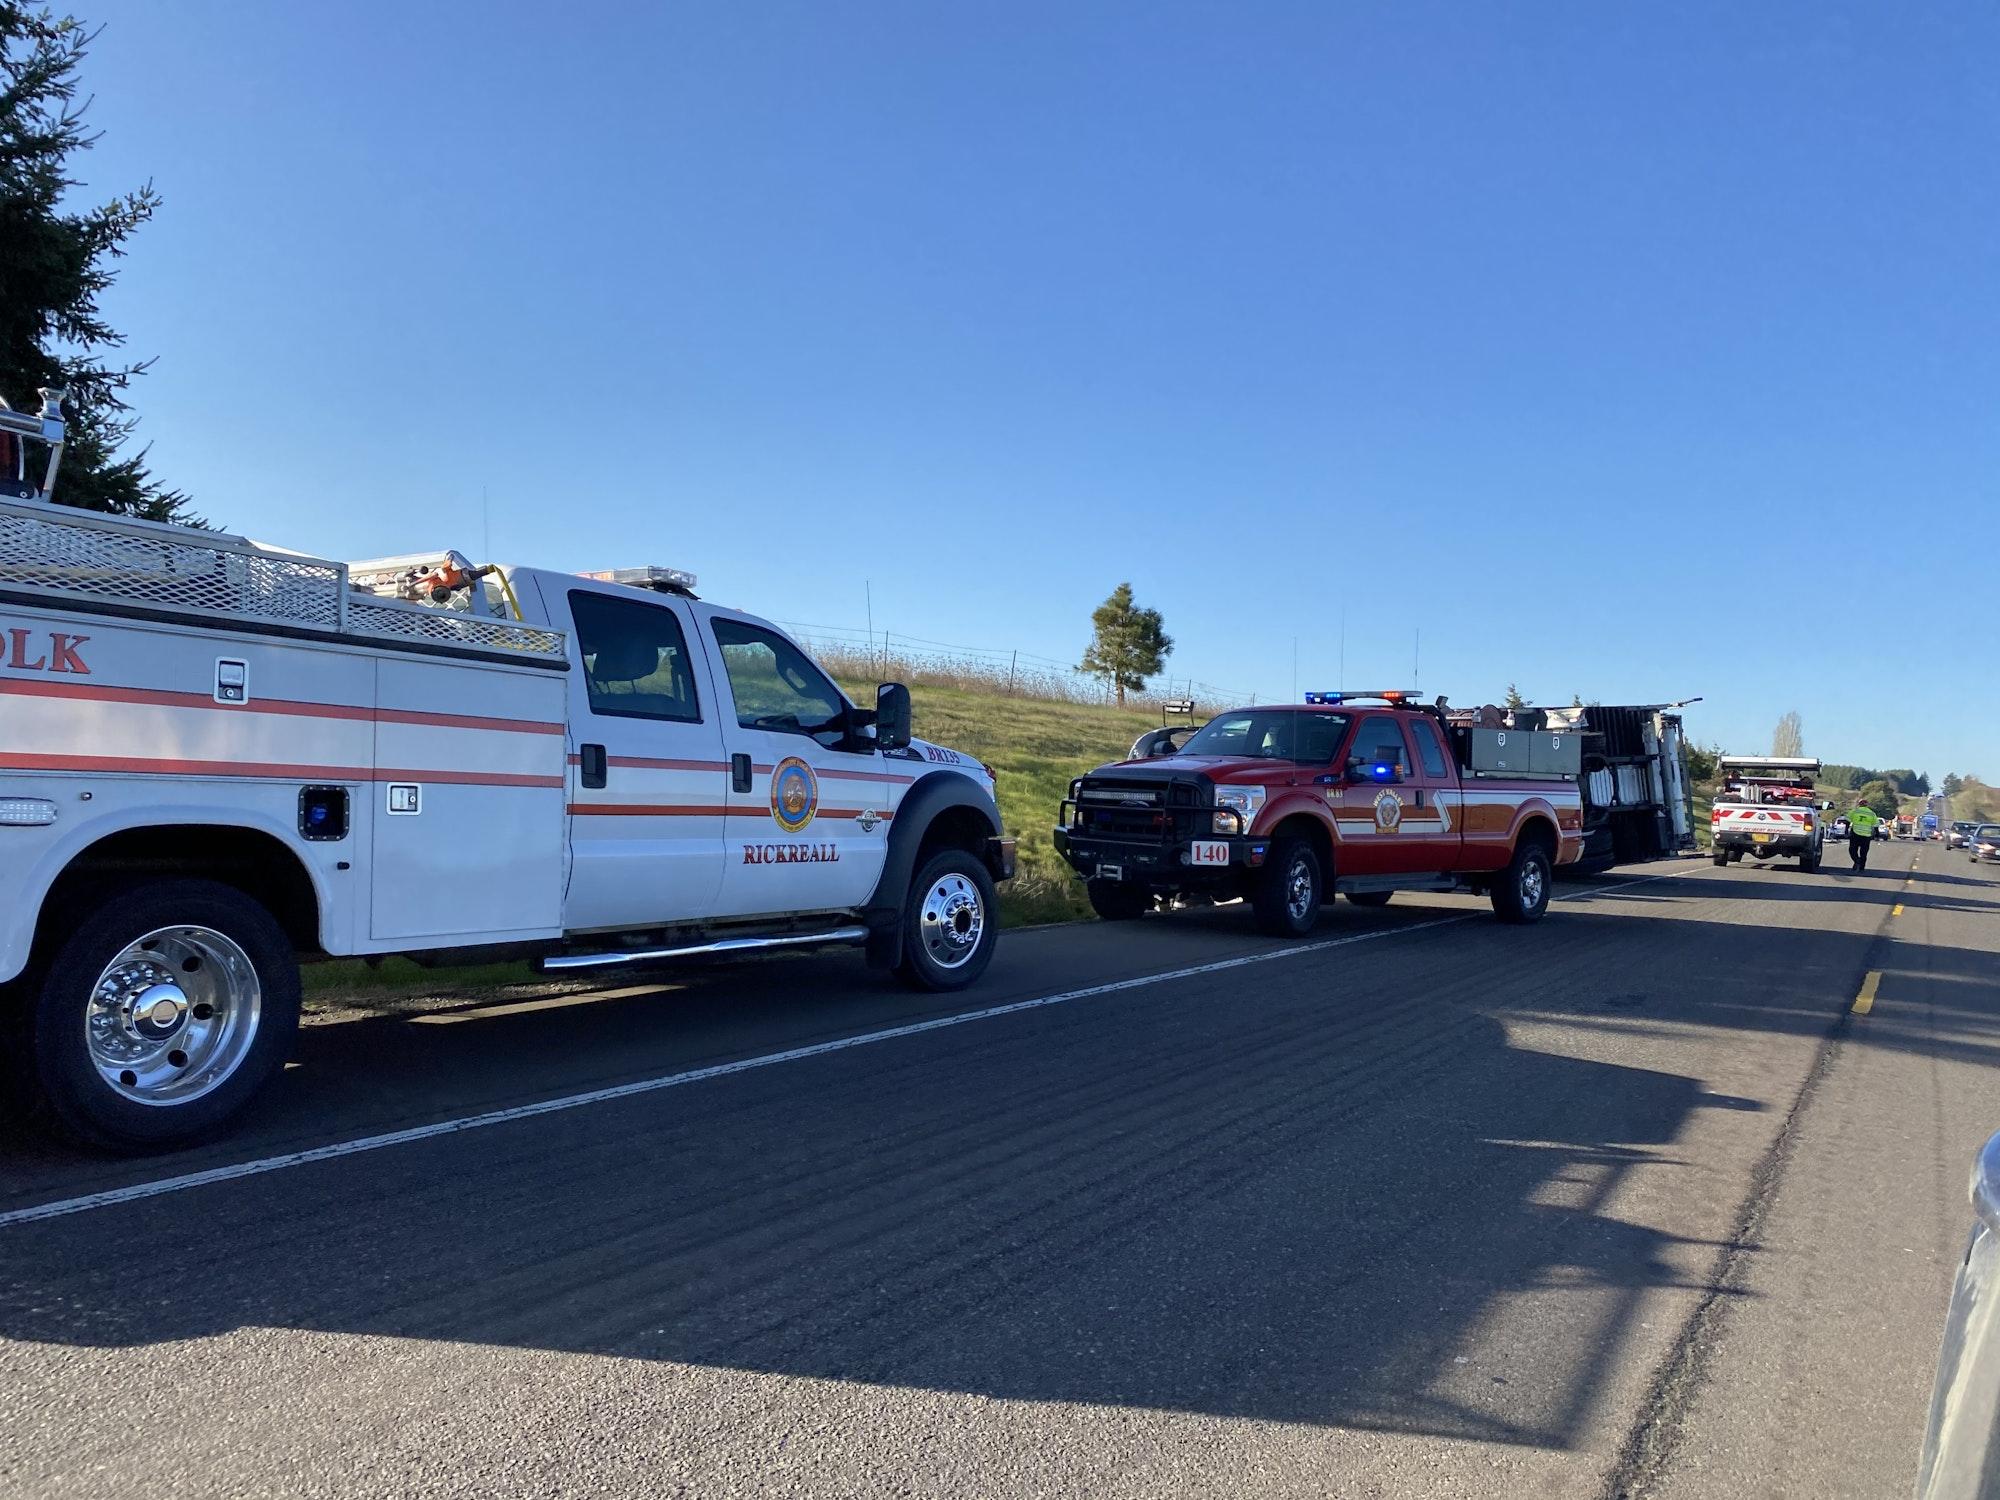 May contain: truck, transportation, vehicle, asphalt, tarmac, human, and person